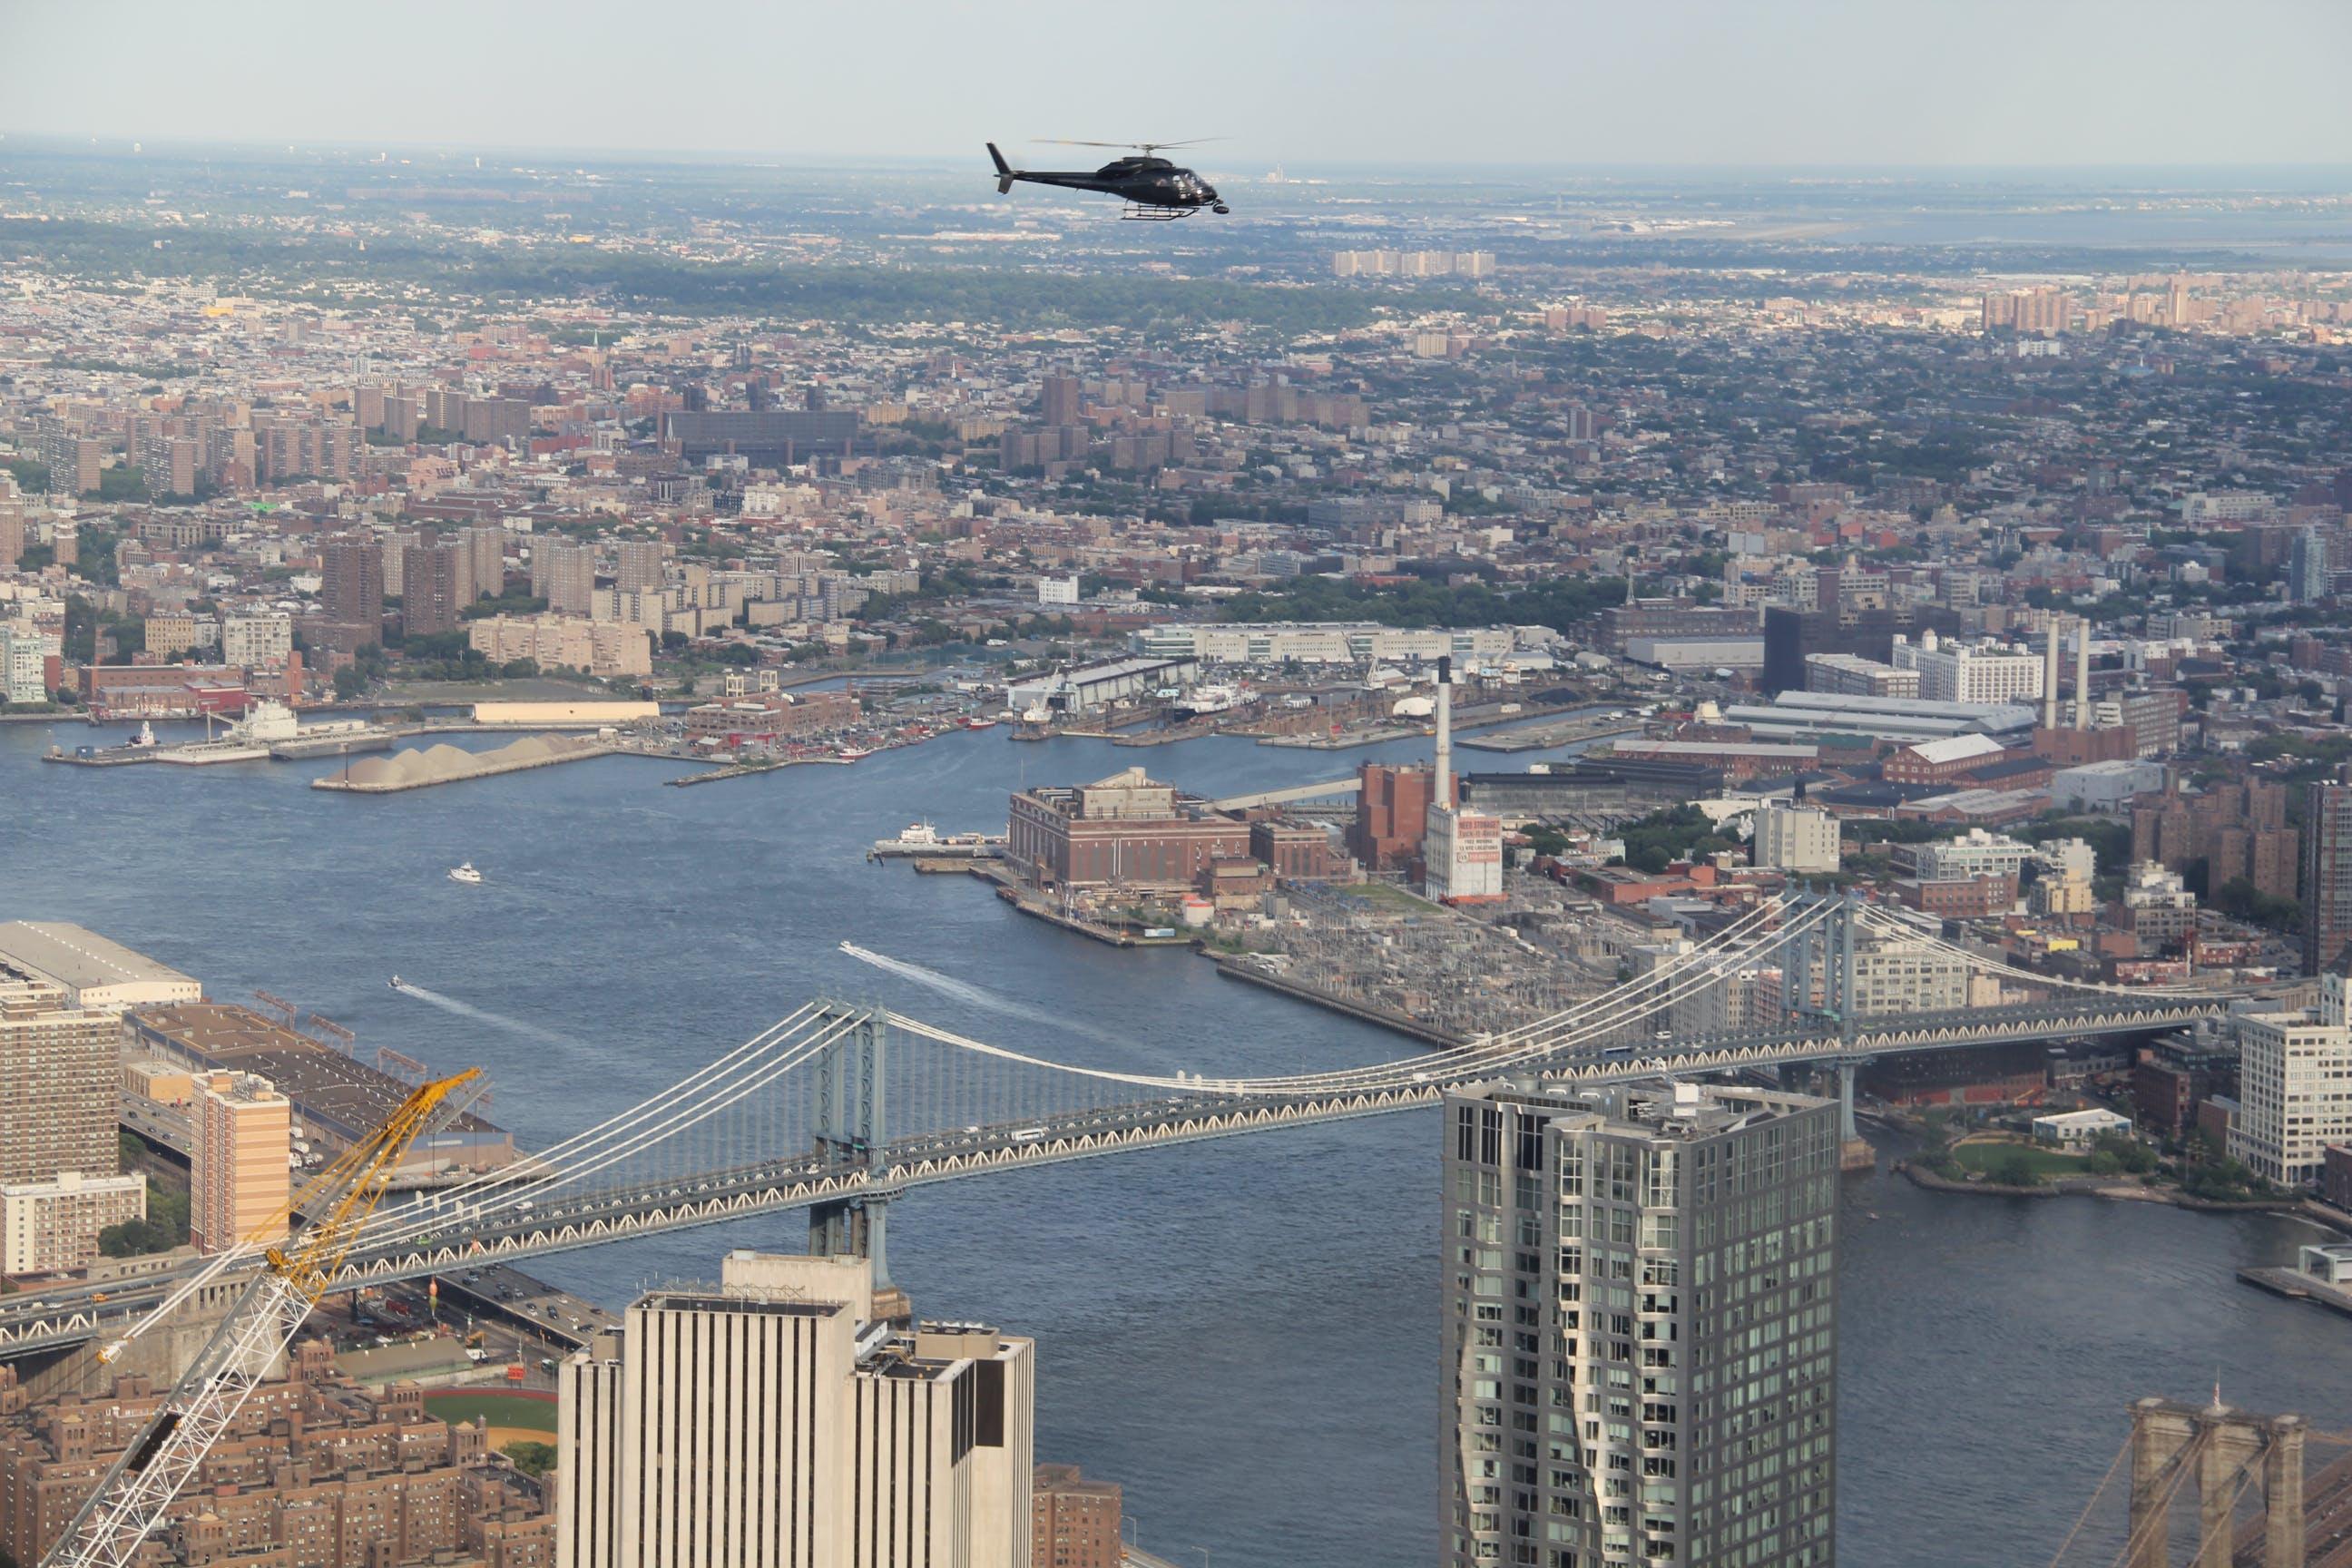 Free stock photo of bridge, chopper, chopper over the city, new york city